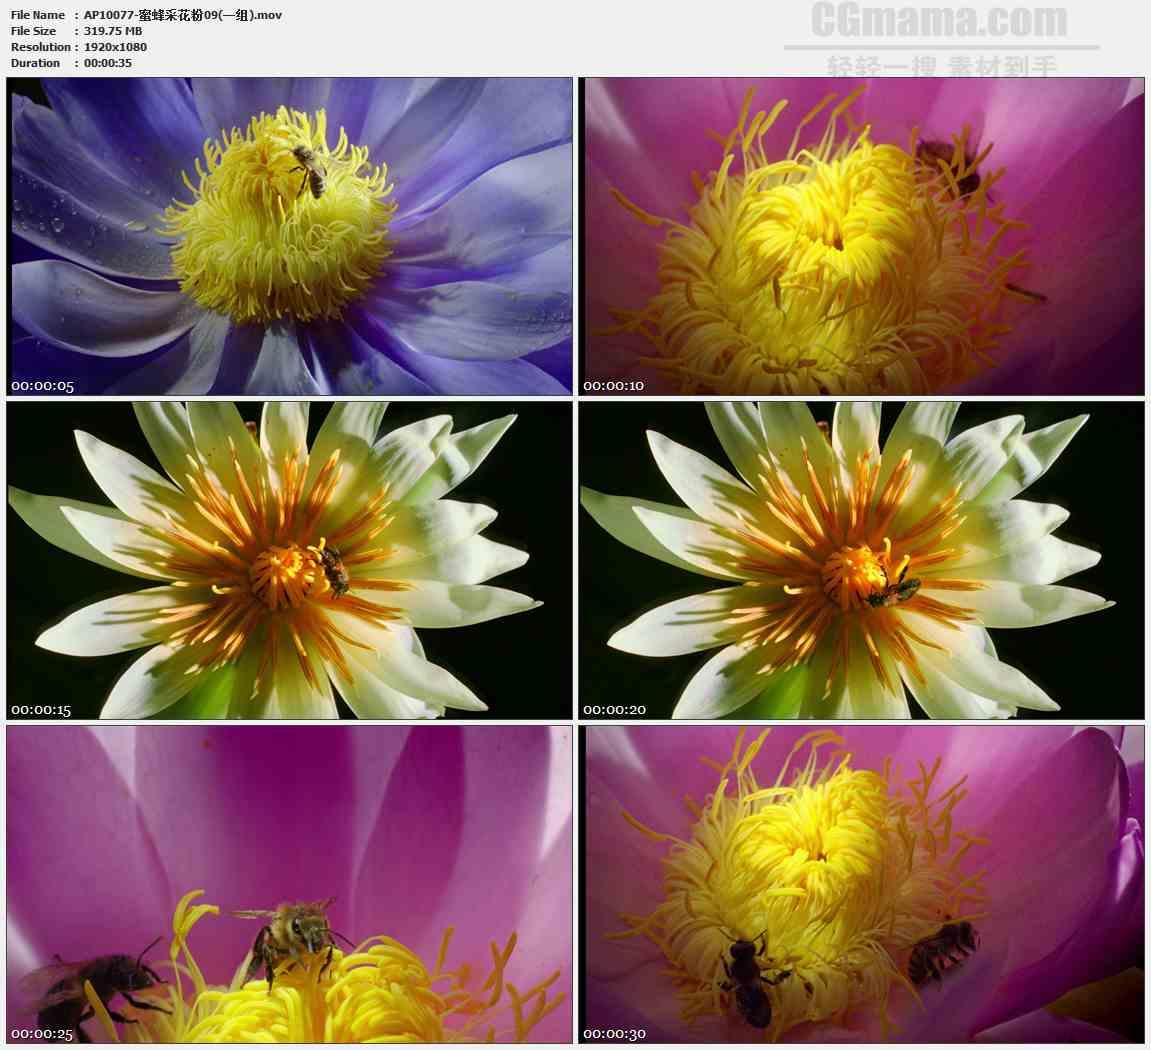 AP10077-紫色睡莲花蕊蜜蜂采蜜特写高清实拍视频素材